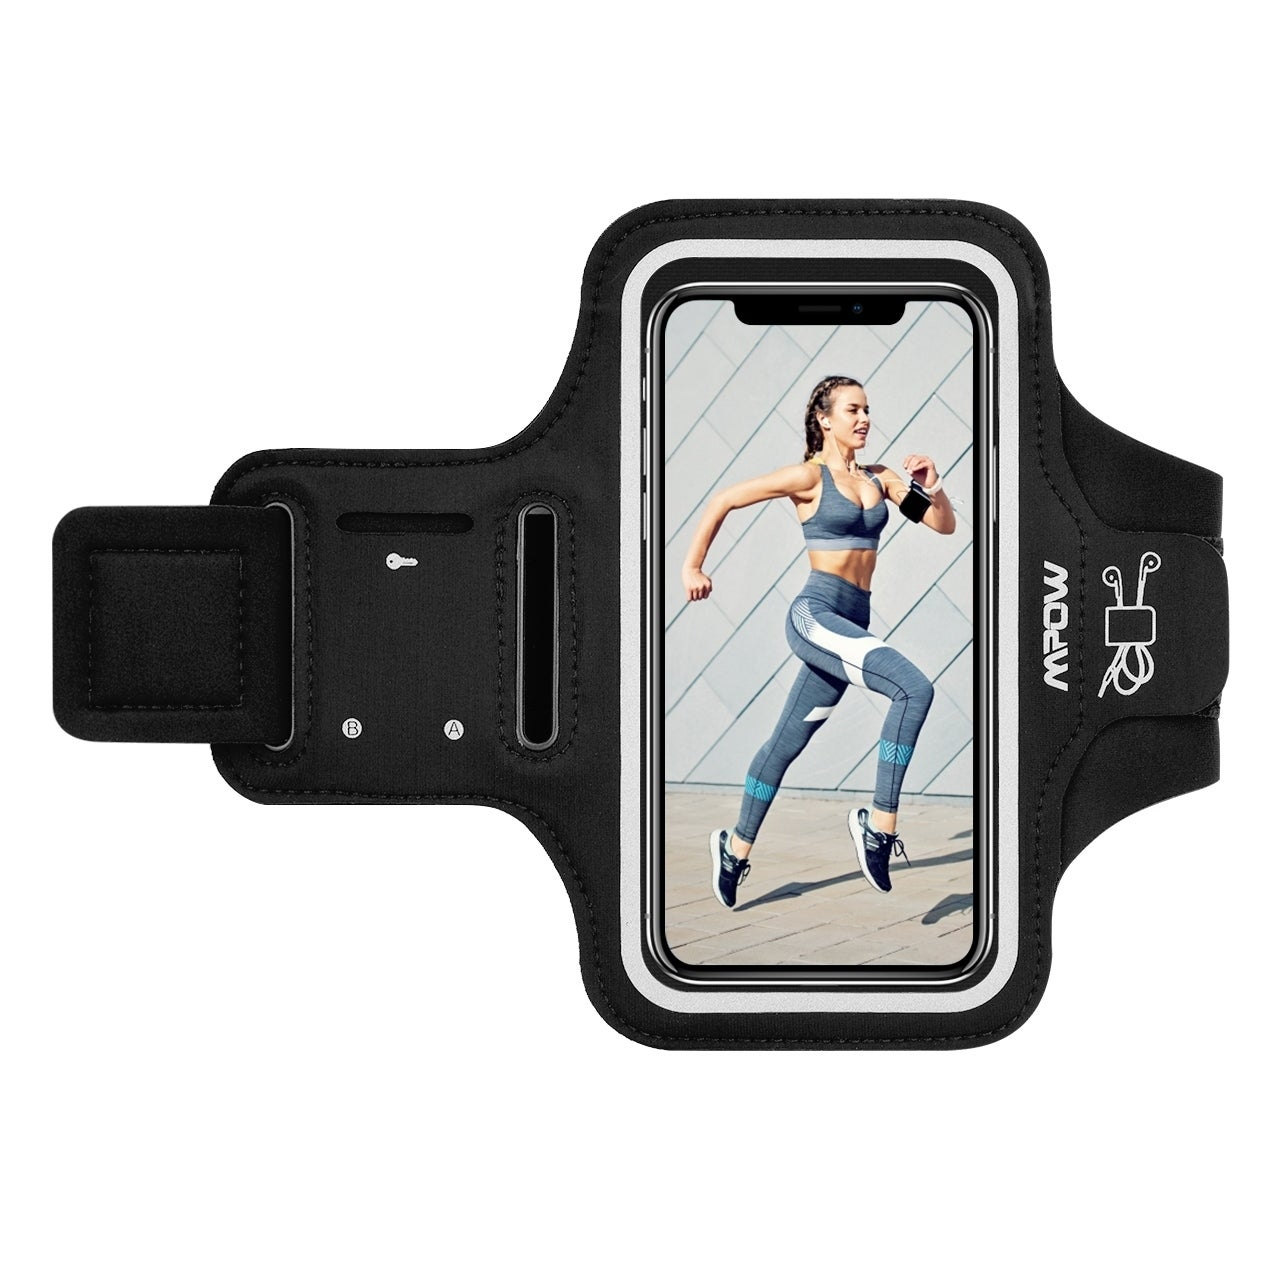 Gym Running Sports Workout Armband Phone Case For Nokia 5.1 Plus Nokia X5